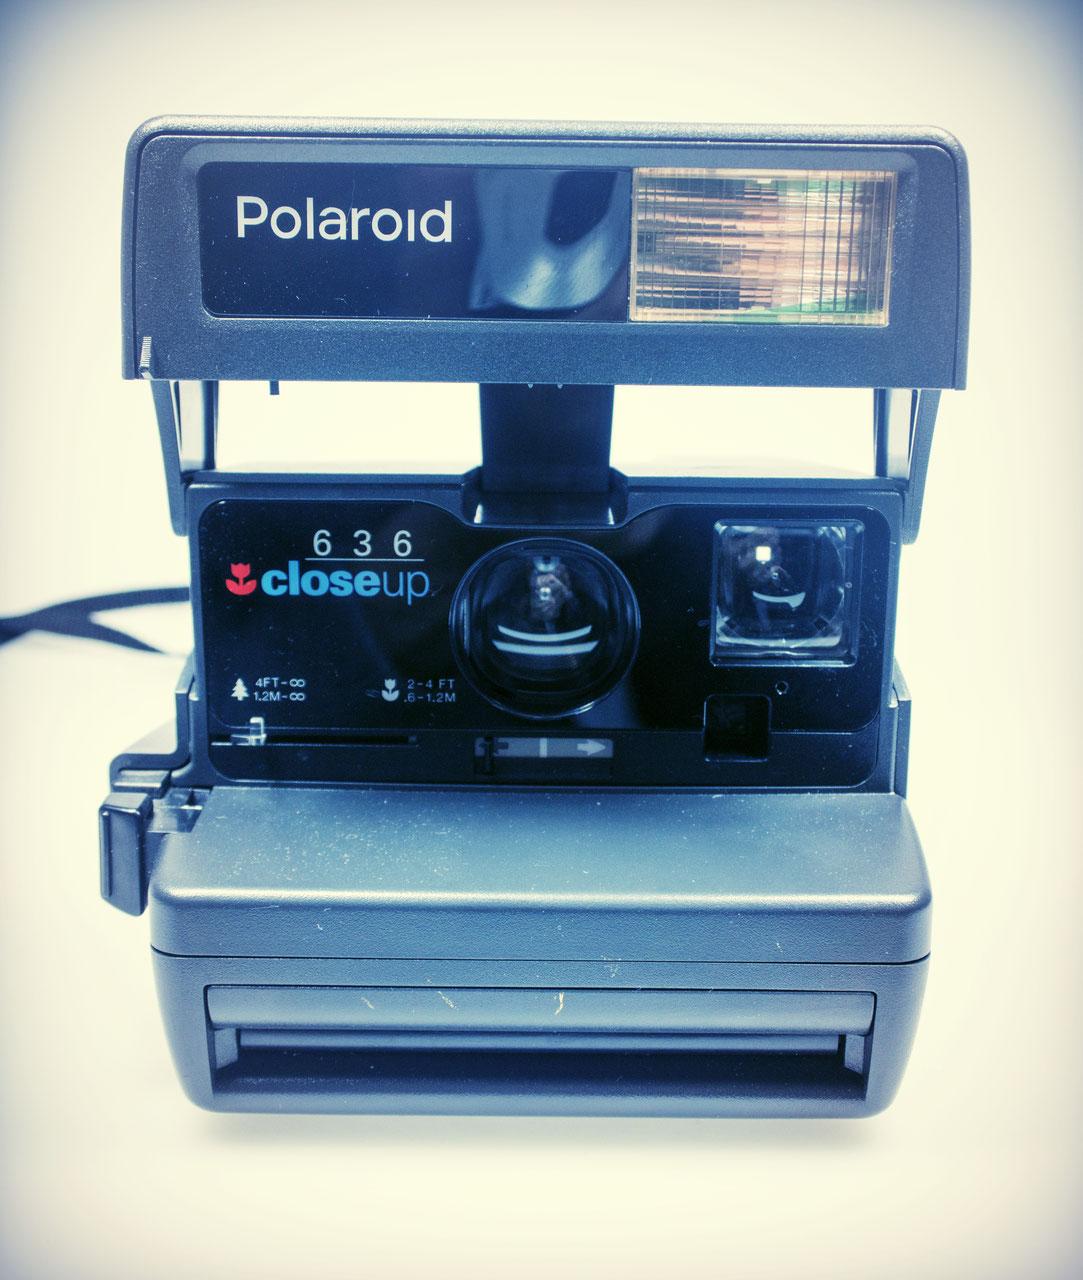 polaroid closeup 636 kamerastelle. Black Bedroom Furniture Sets. Home Design Ideas